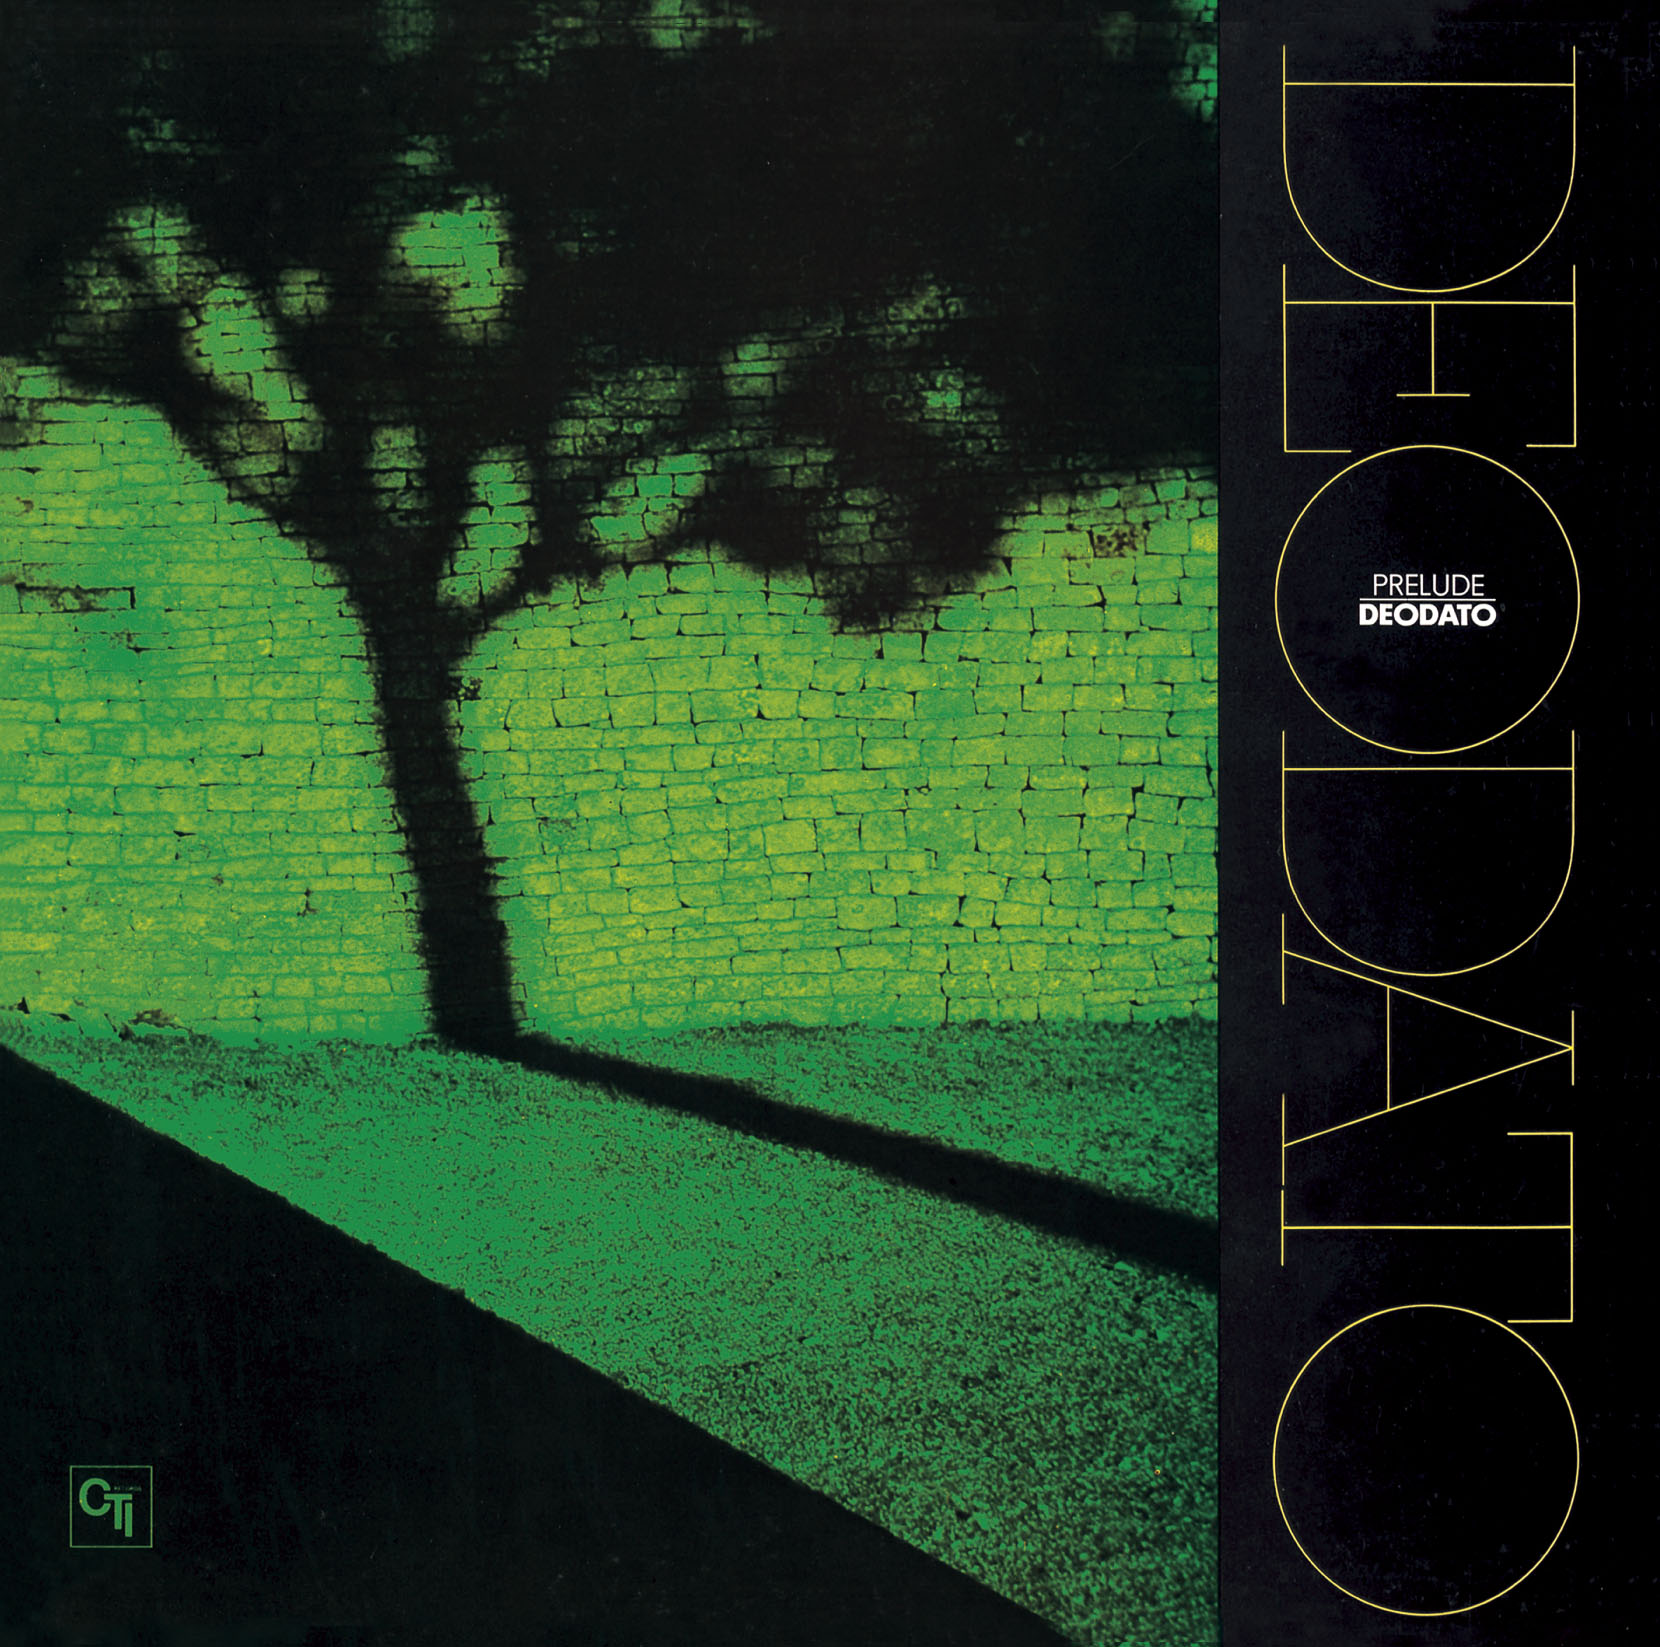 Eumir Deodato 1972 - Prelude